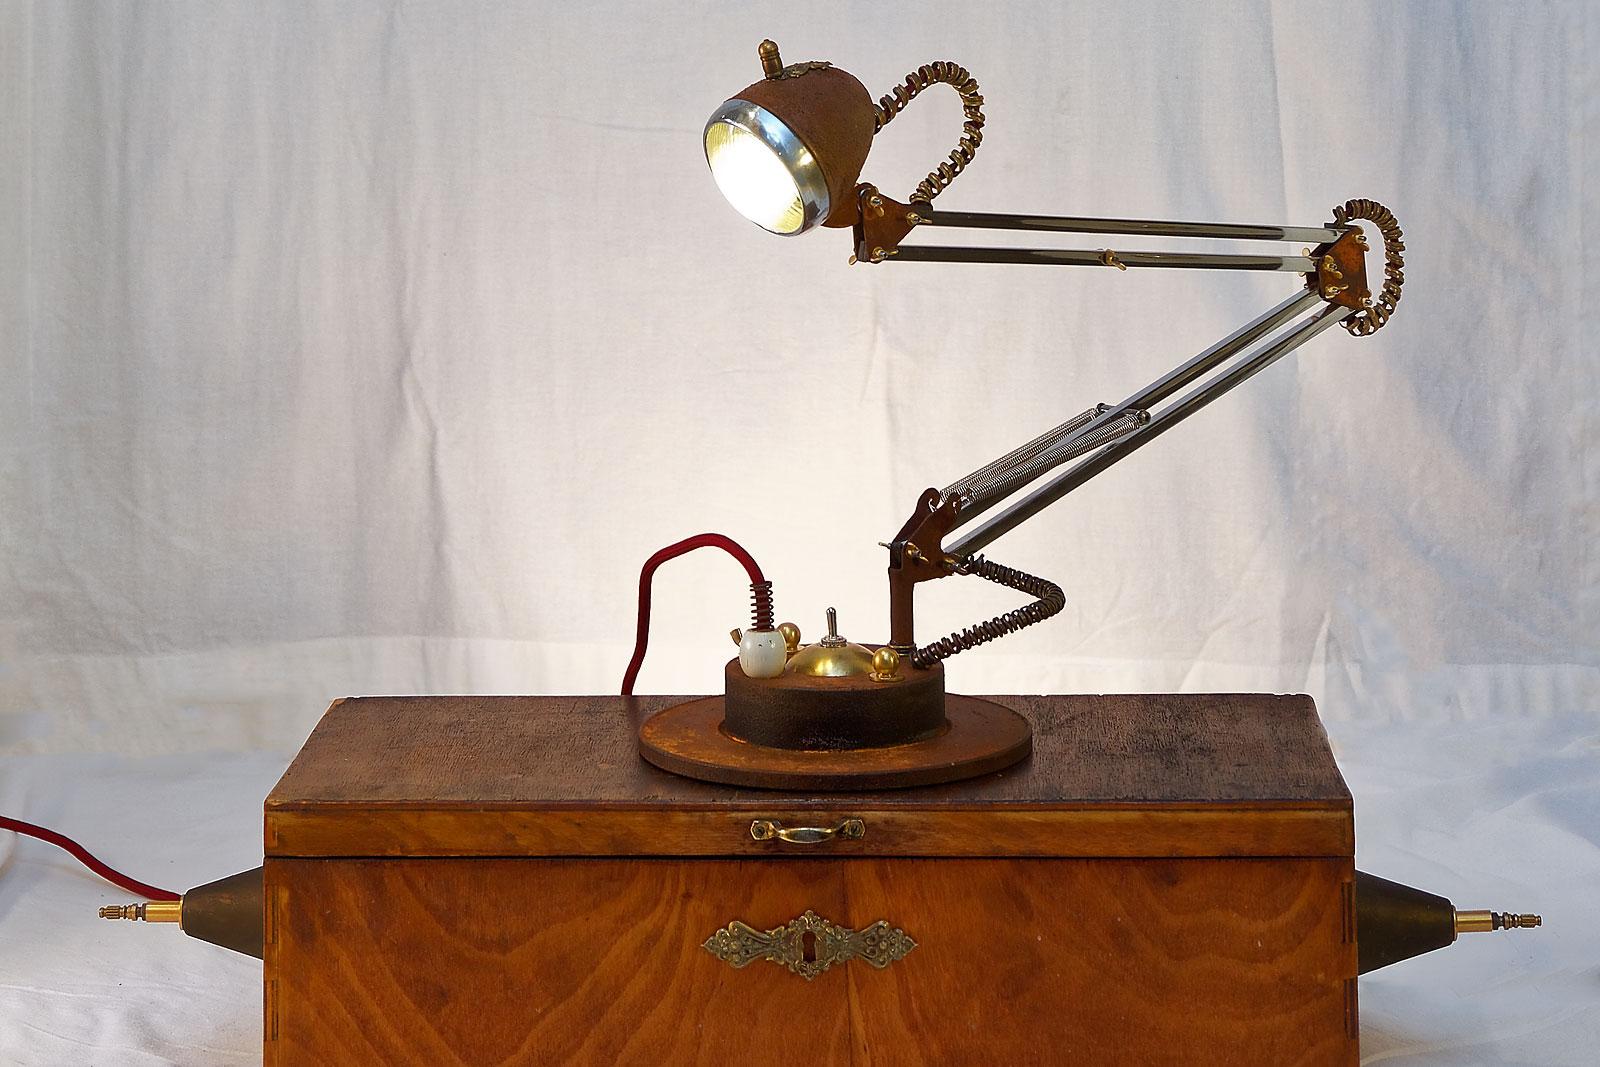 Steampunk table lamp. Vintage. Industrial design. Interior Design. Rat style